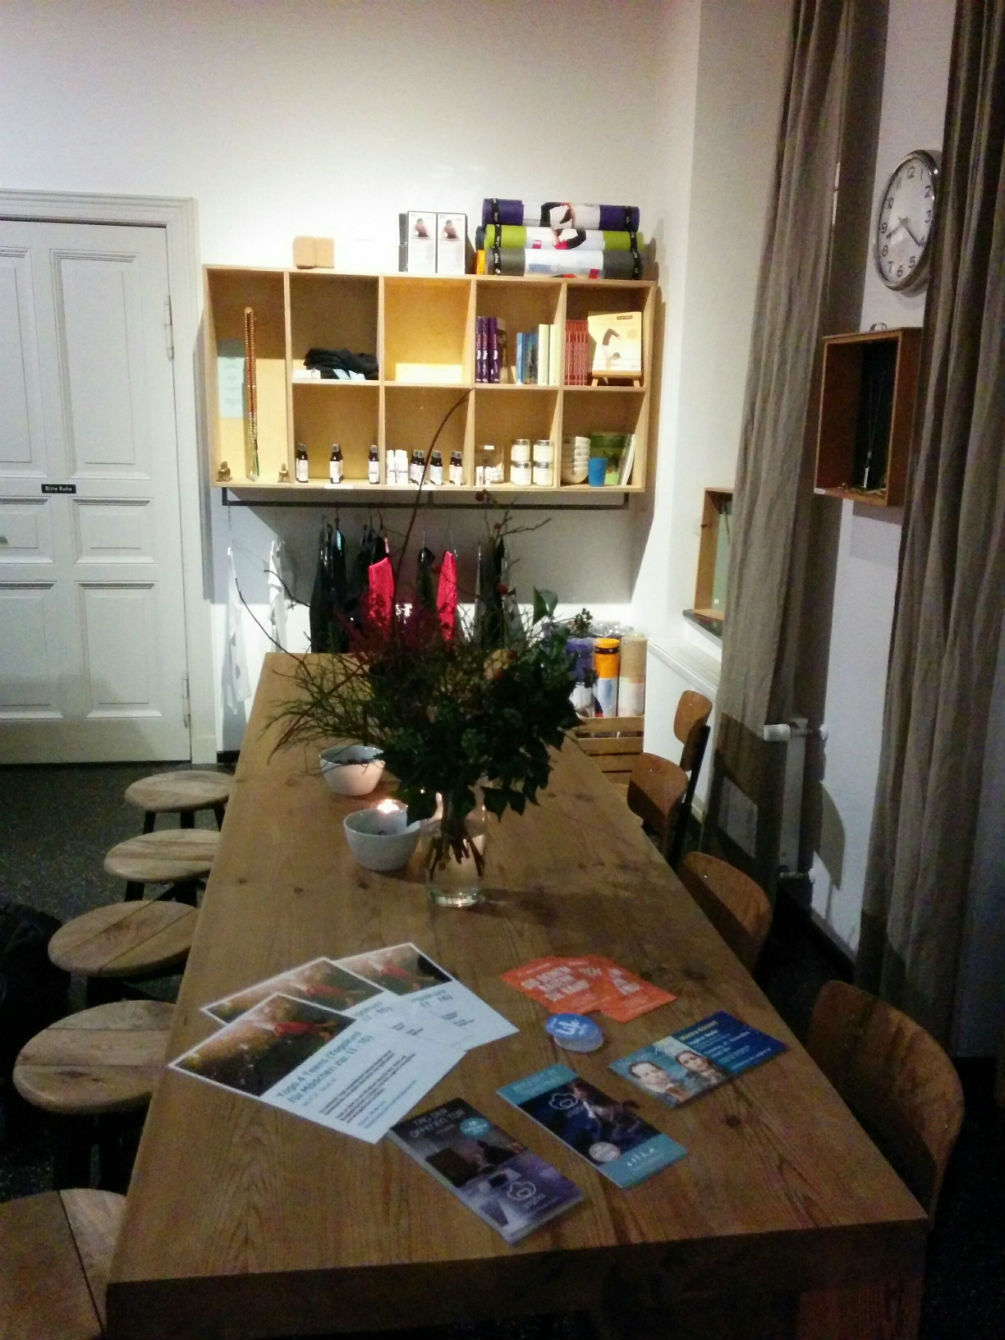 Yogibar Berlin Tisch